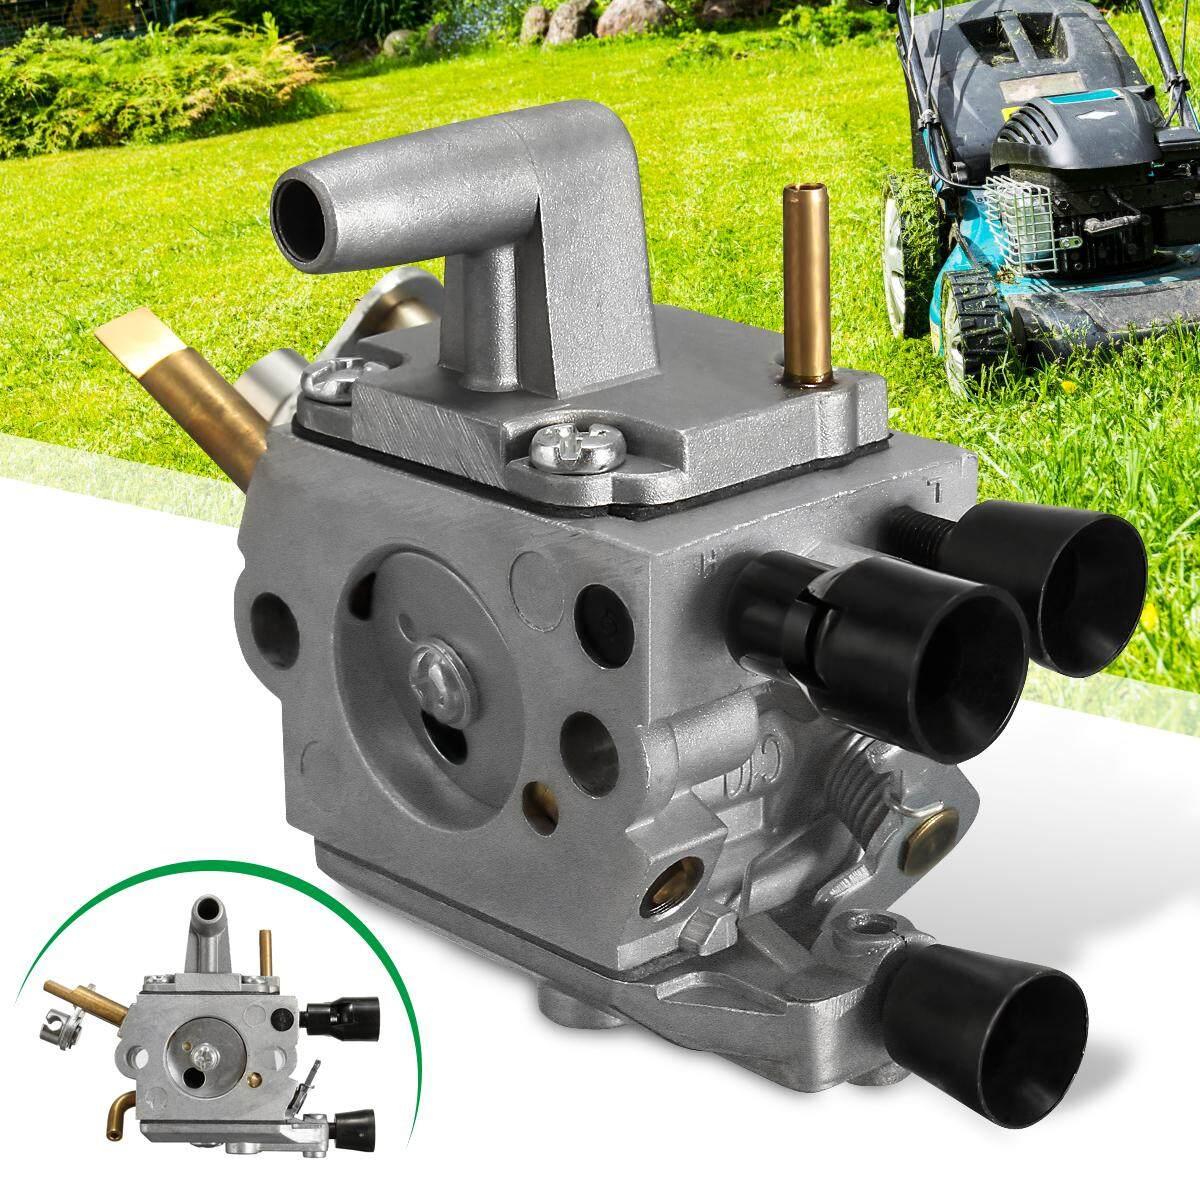 【Free Vận Chuyển + Đèn Flash Deal】Carburetor Carb Cho STIHL FS400 FS450 FS480 SP400 450 ZAMA C1Q-S34H STRIMMER